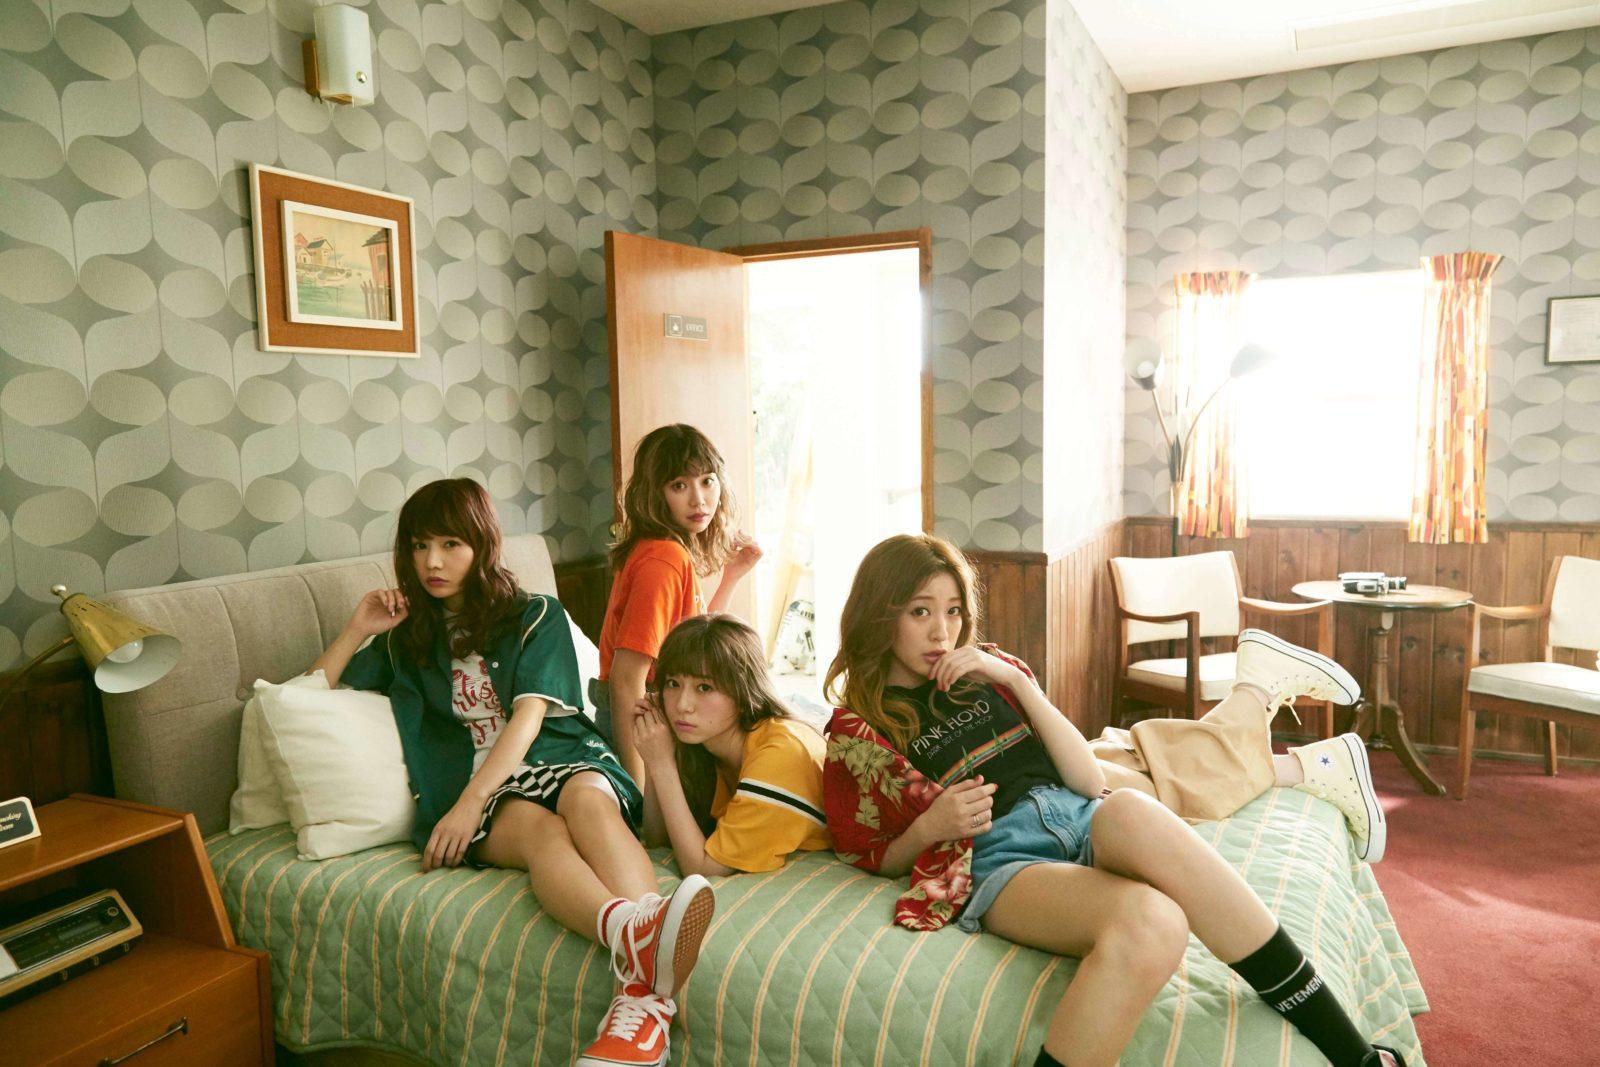 SILENT SIREN、ニューシングル新ヴィジュアル一挙公開!メンバーからコメントも到着サムネイル画像